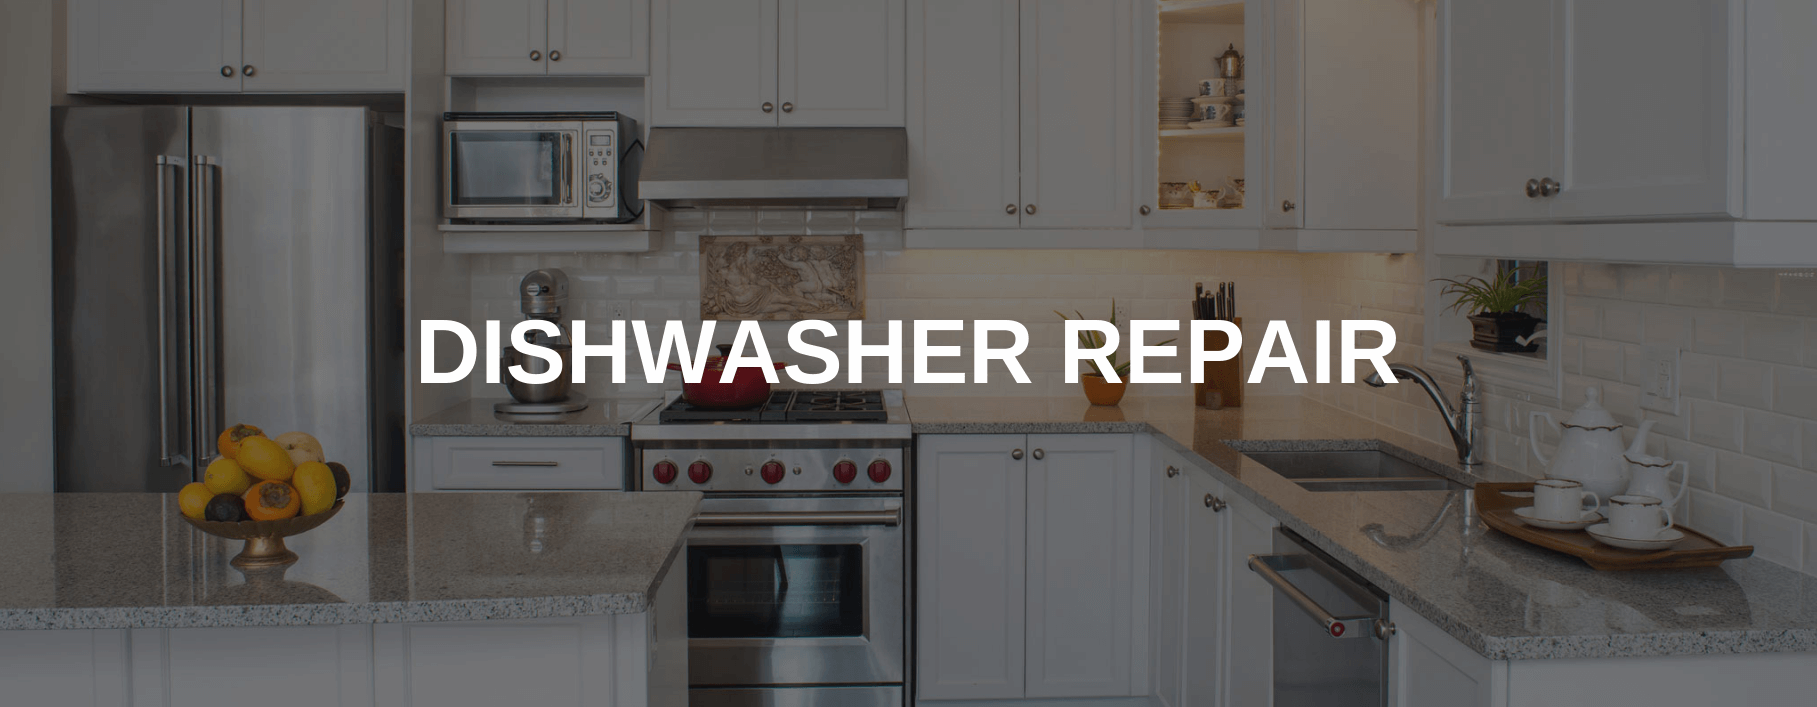 dishwasher repair milford